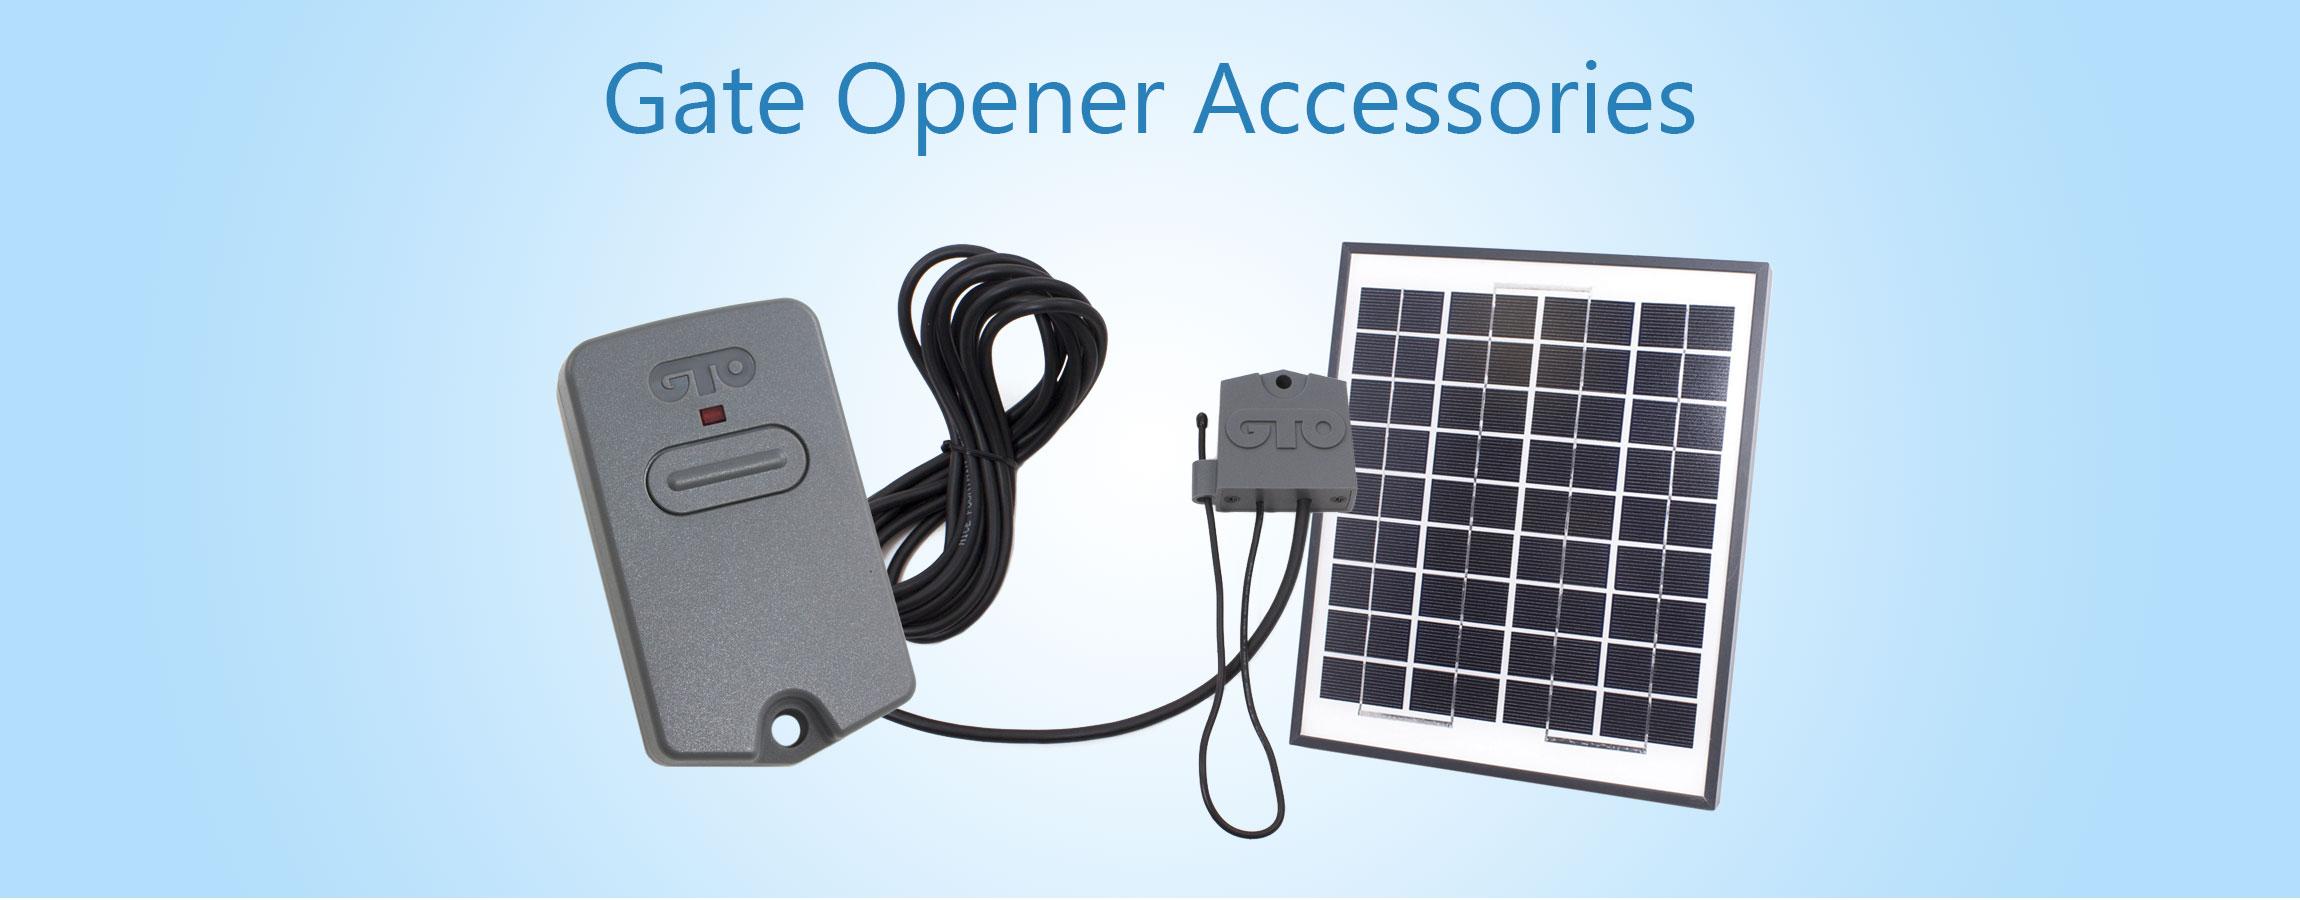 Gto Pro Automatic Gate Openers Linear Pro Access Gto